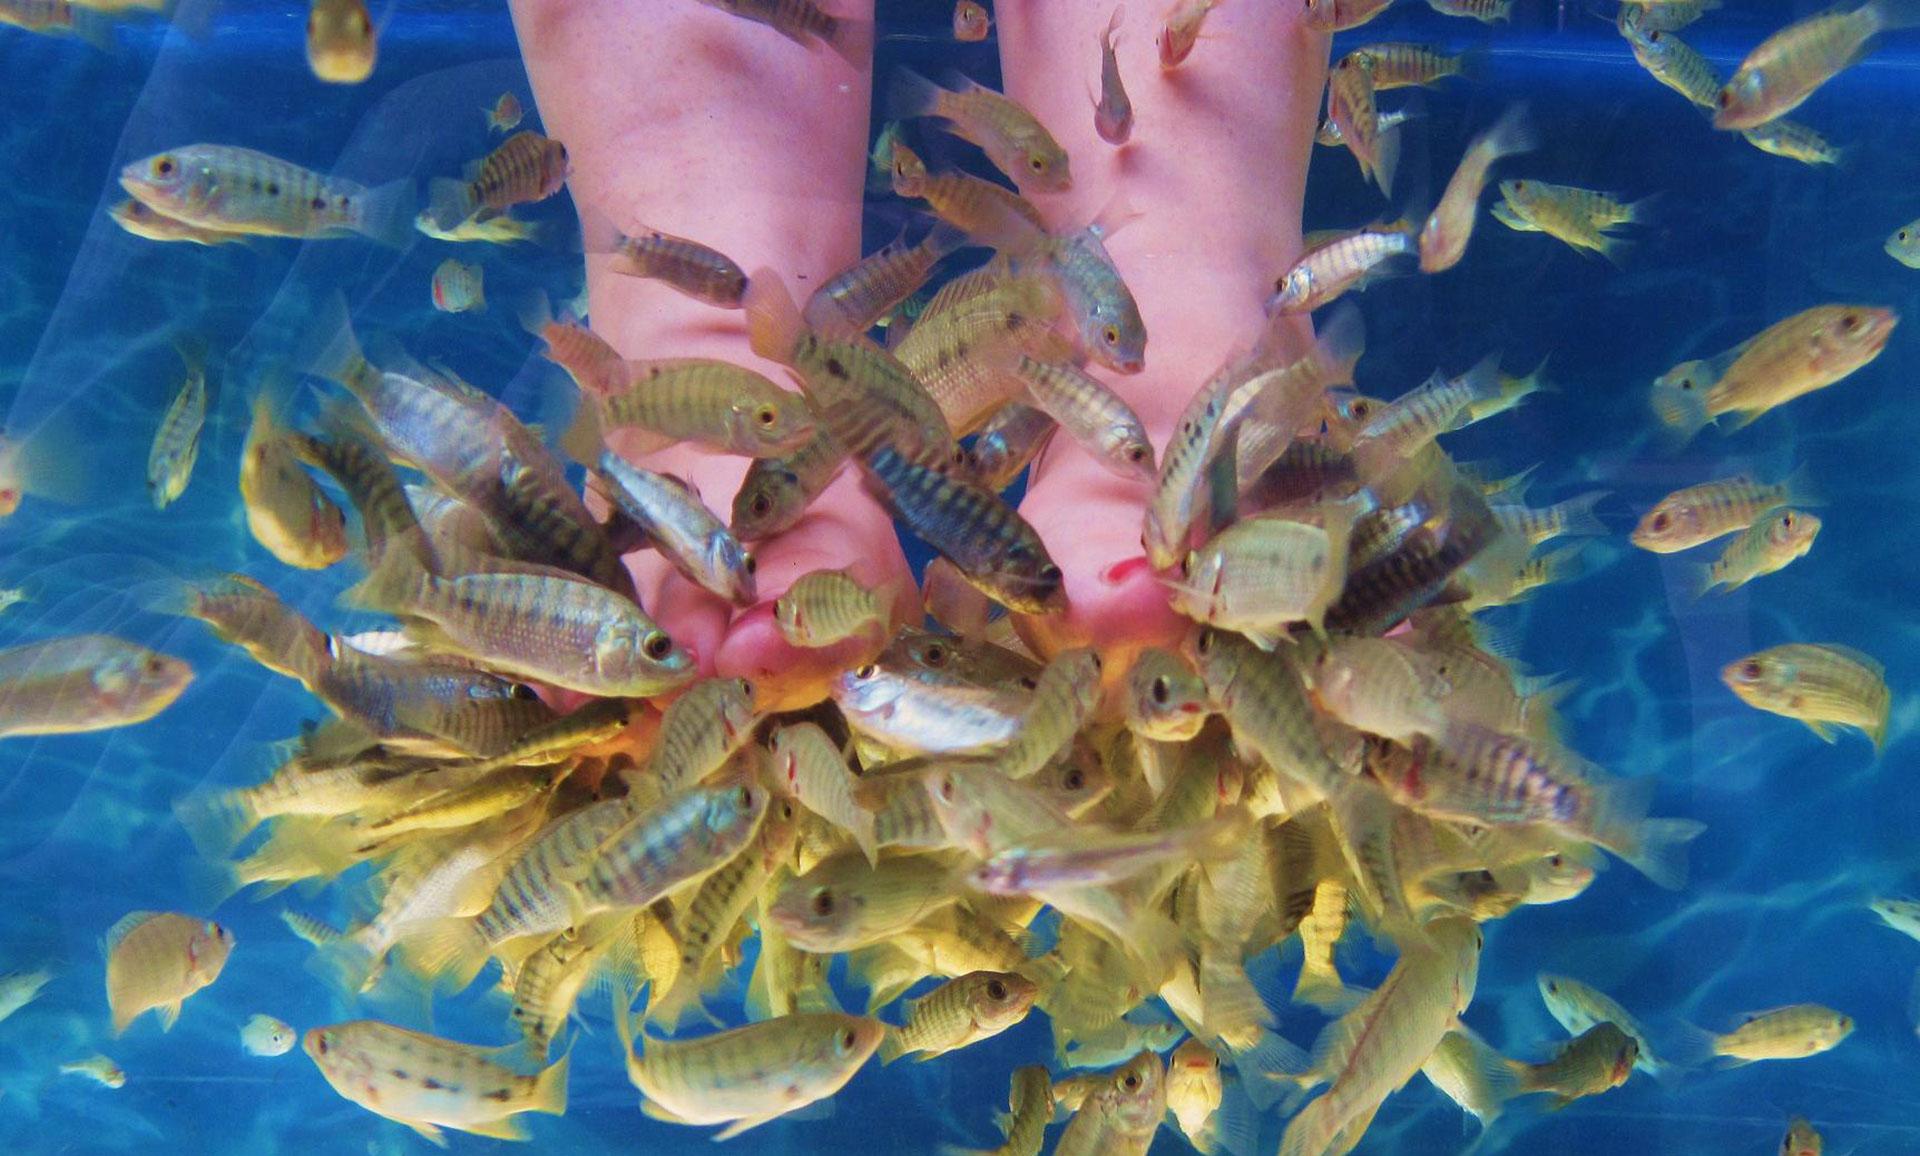 Fish spa acquaplus waterpark hersonissos crete for Fish table game tips